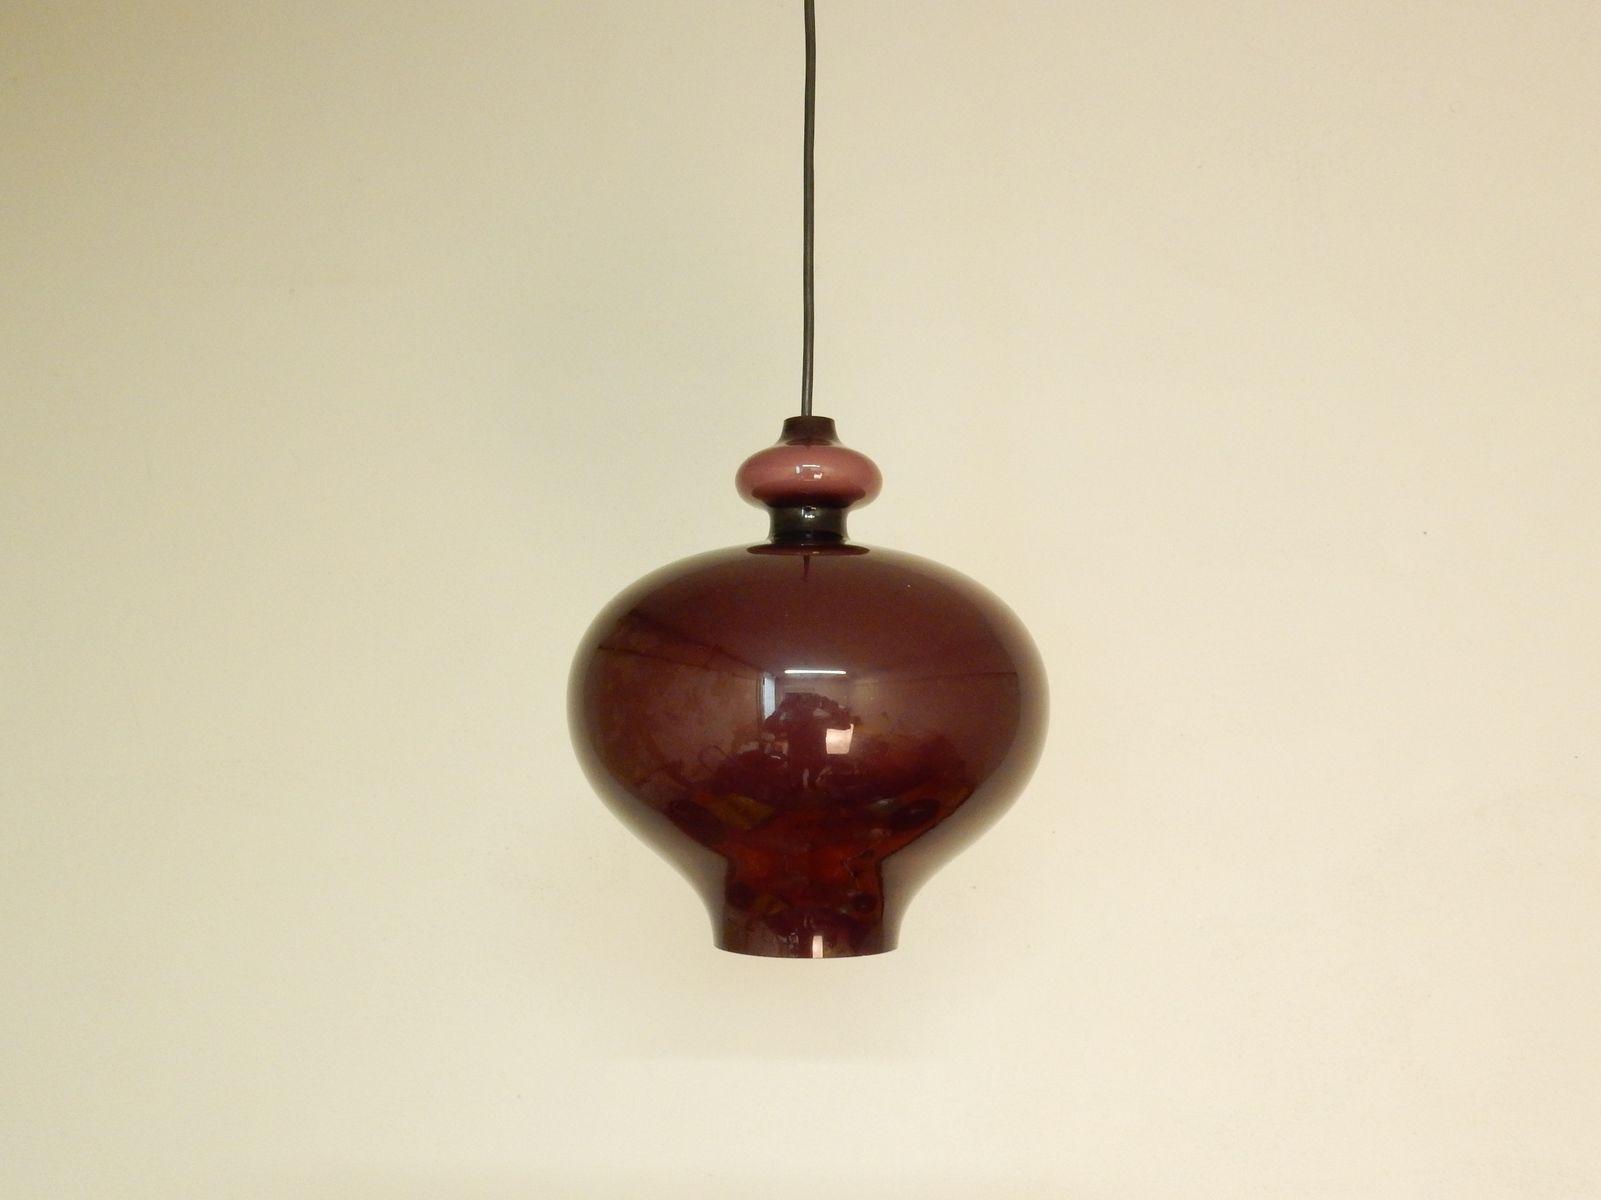 Purple glass pendant light by hans agne jakobsson 1960s for sale at purple glass pendant light by hans agne jakobsson 1960s for sale at pamono arubaitofo Image collections